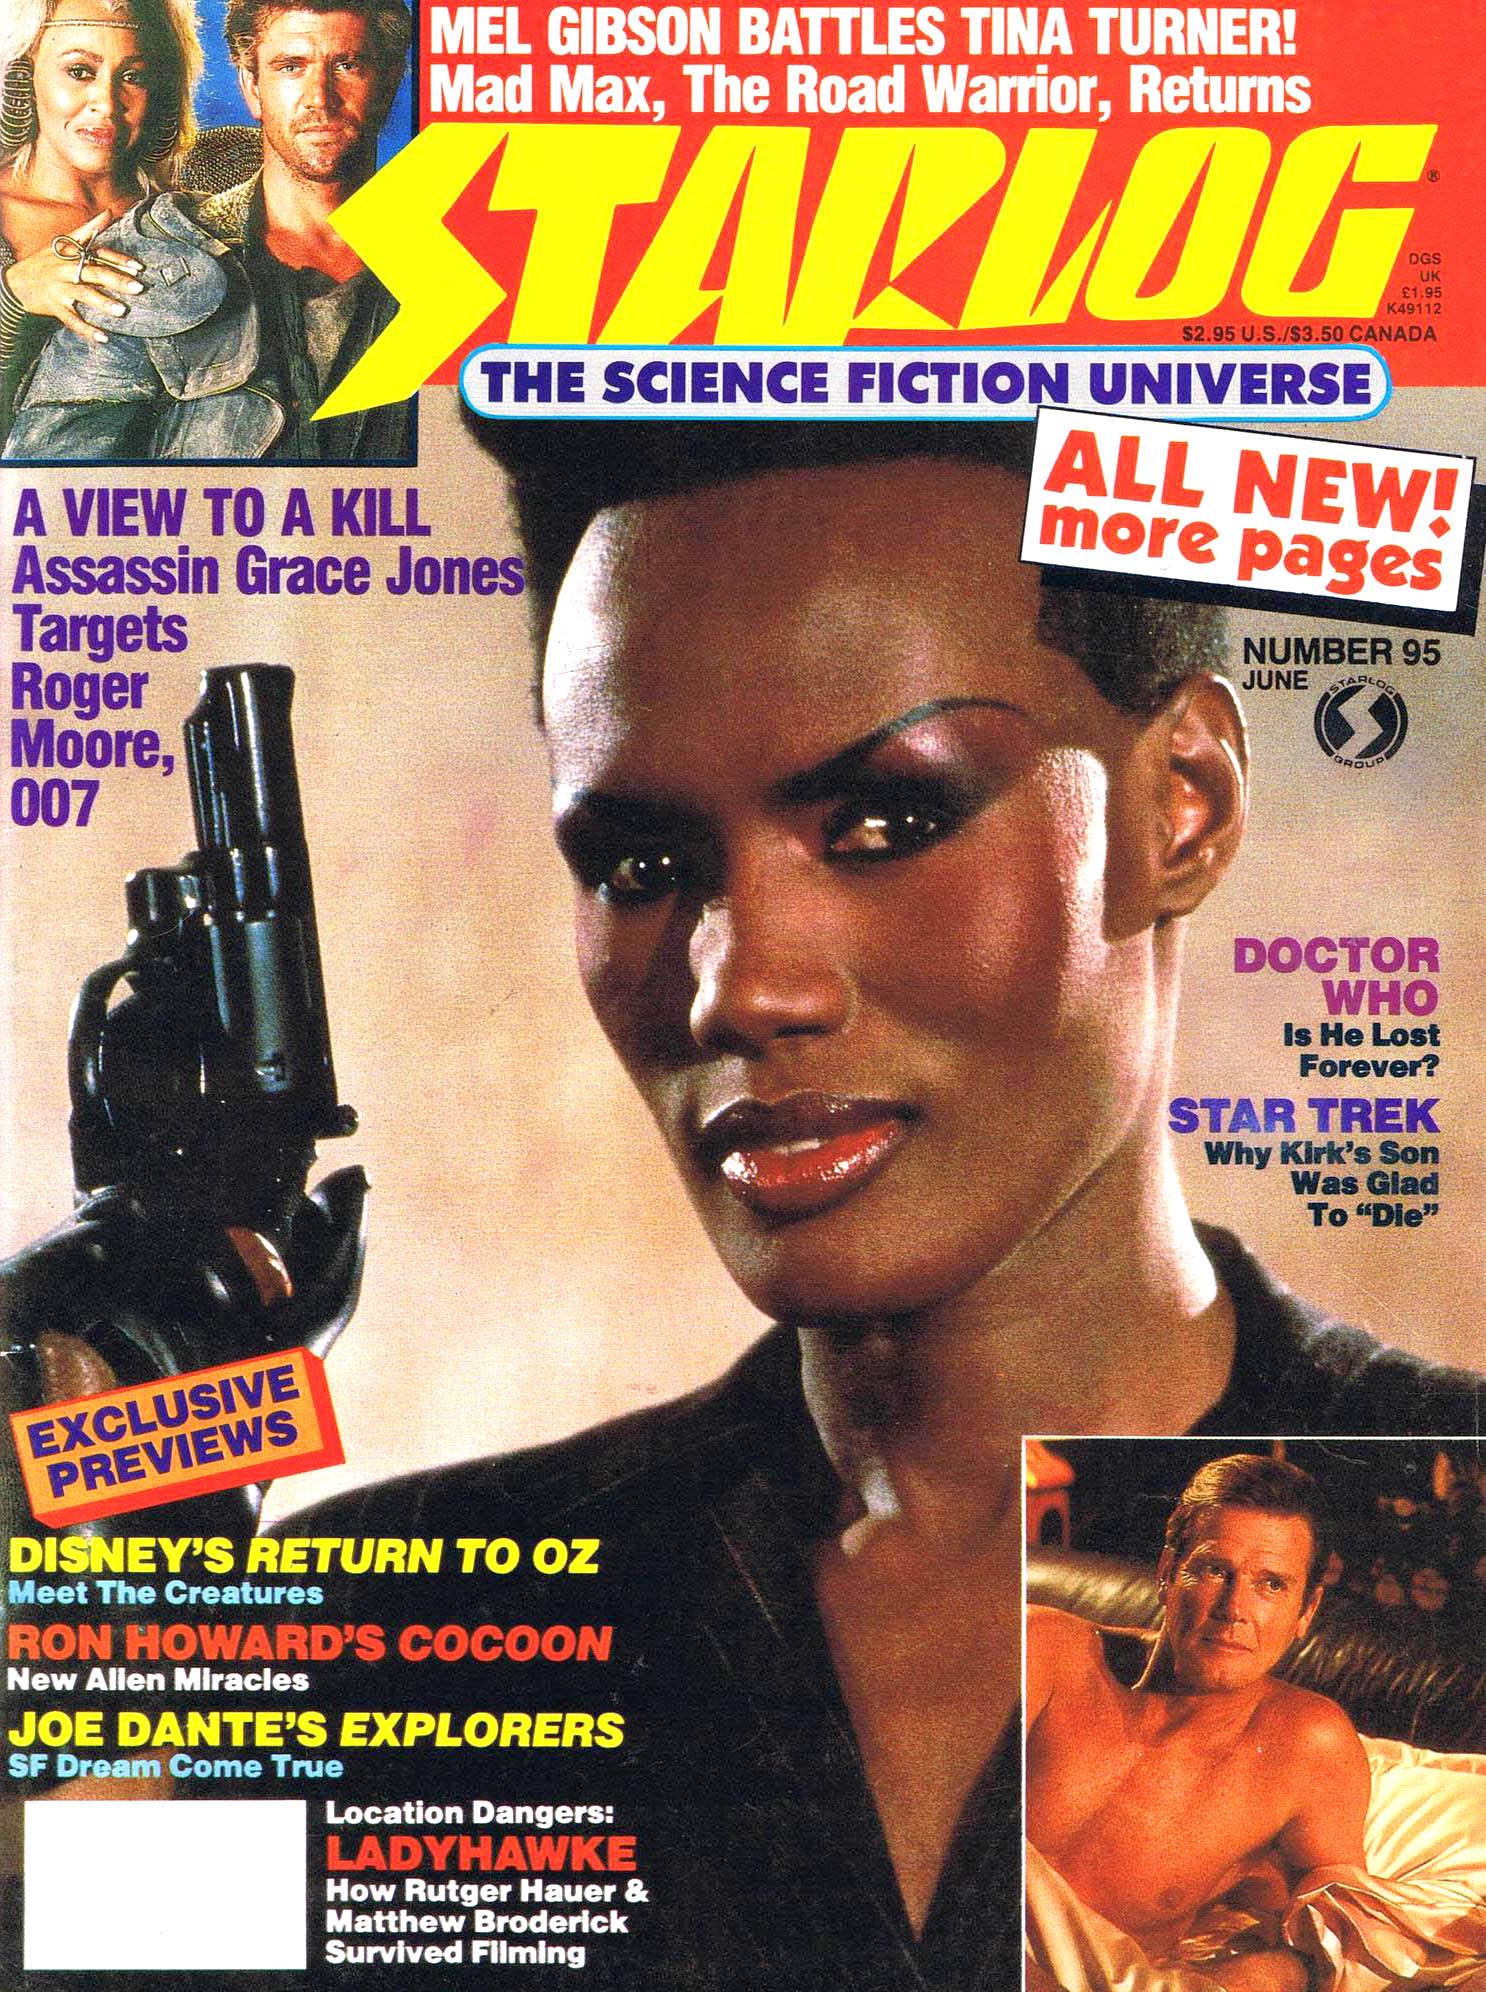 Starlog 095 1985 06 Bond-1.jpg